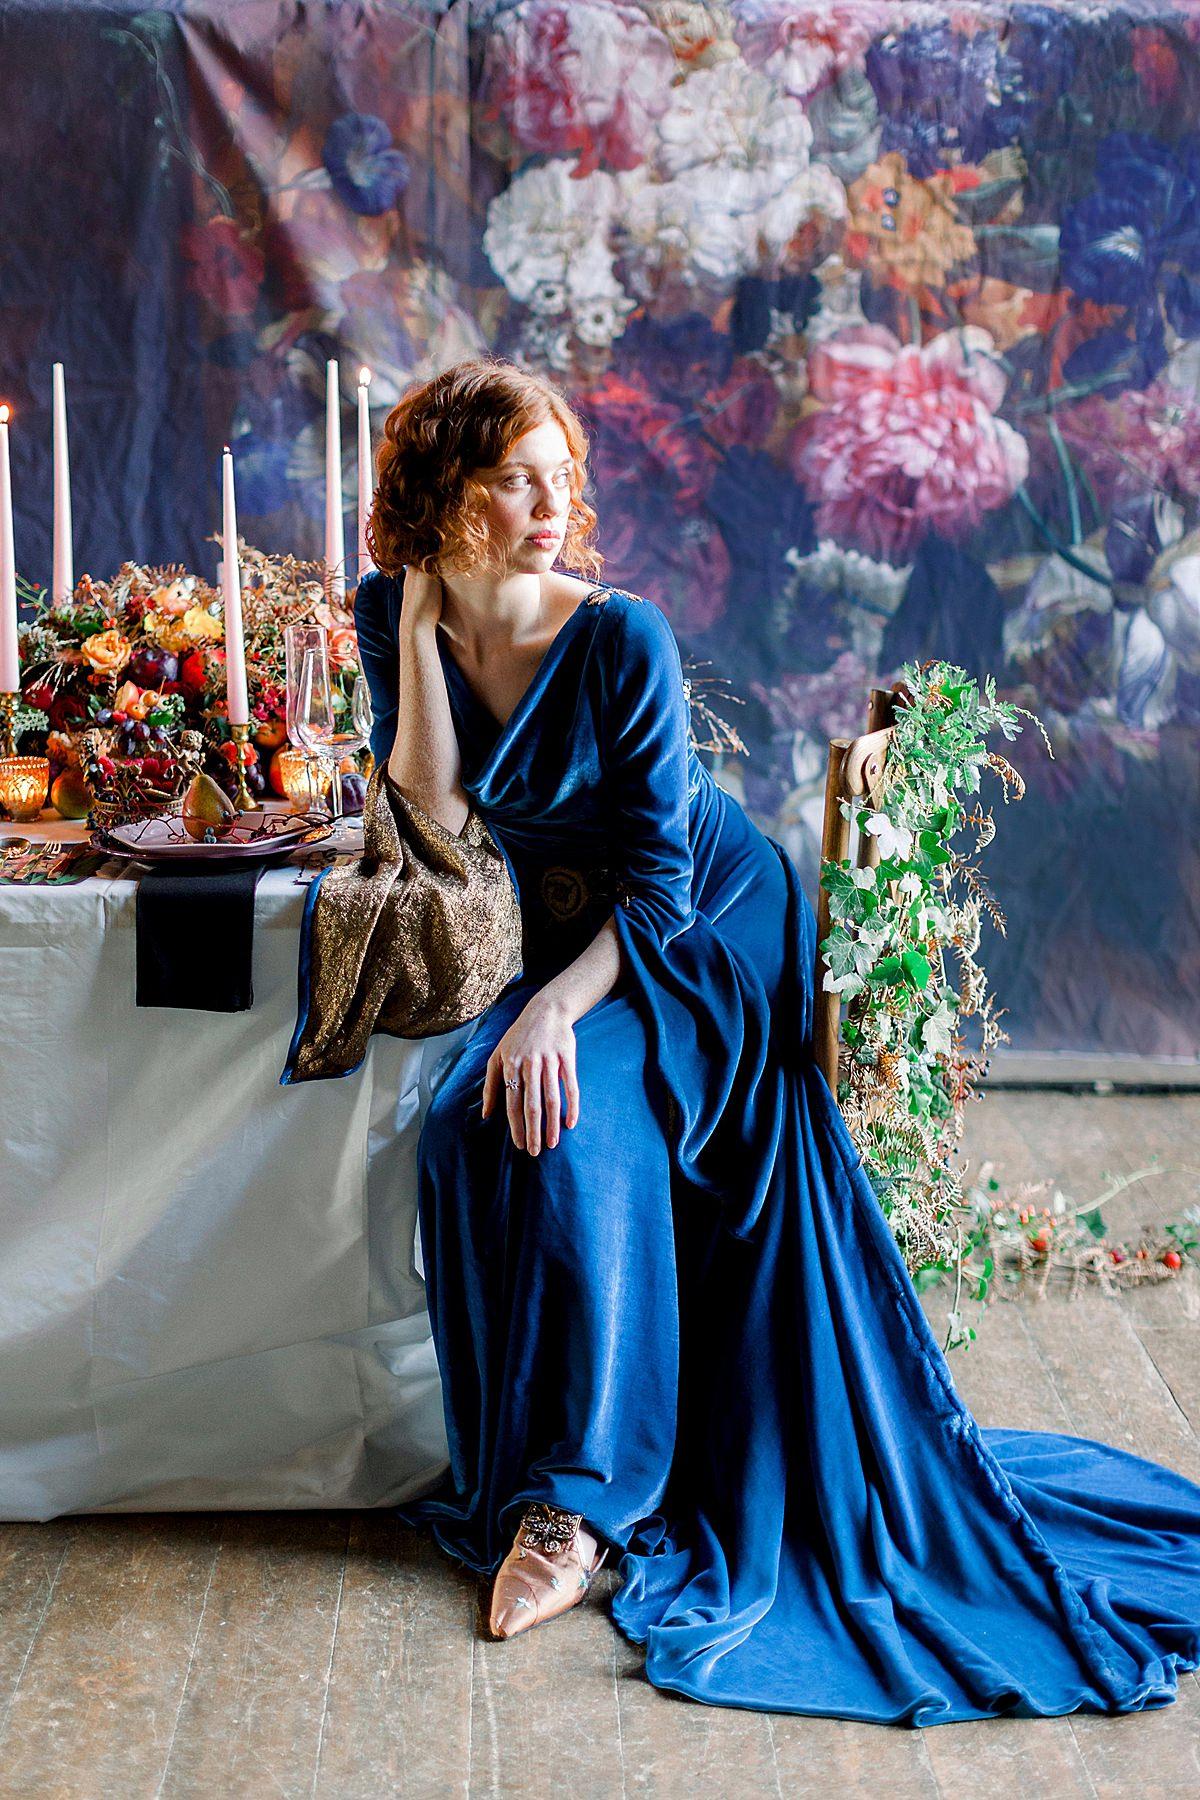 Briar-Rose-Blue-Velvet-Interior-JFD-JoBradbury (31).jpg